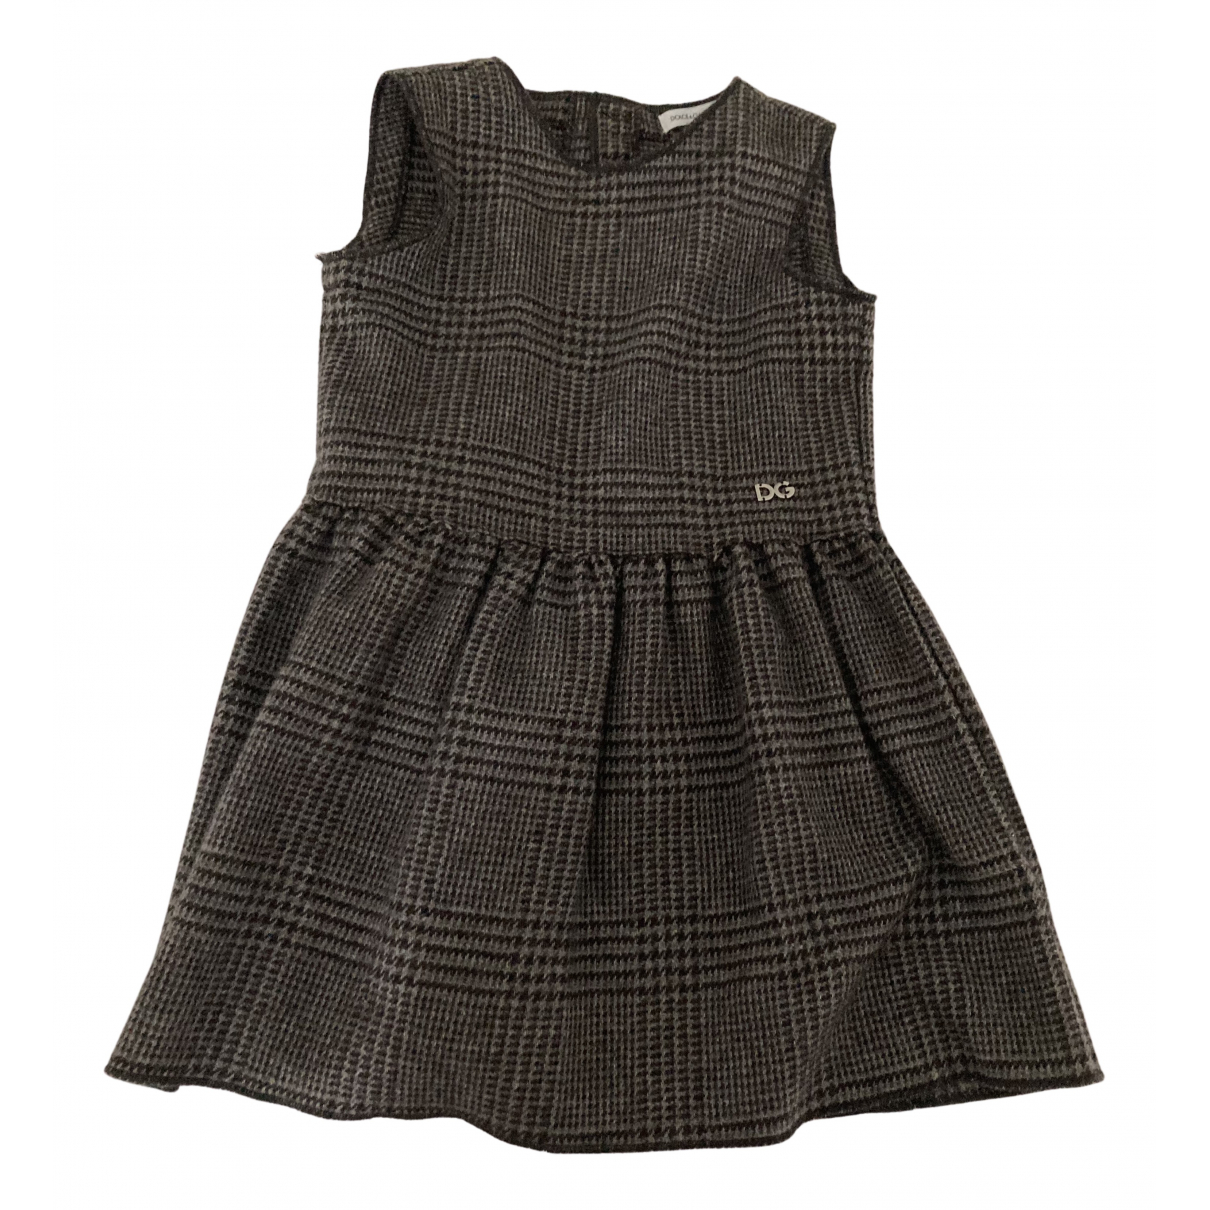 Dolce & Gabbana \N Kleid in  Grau Kaschmir